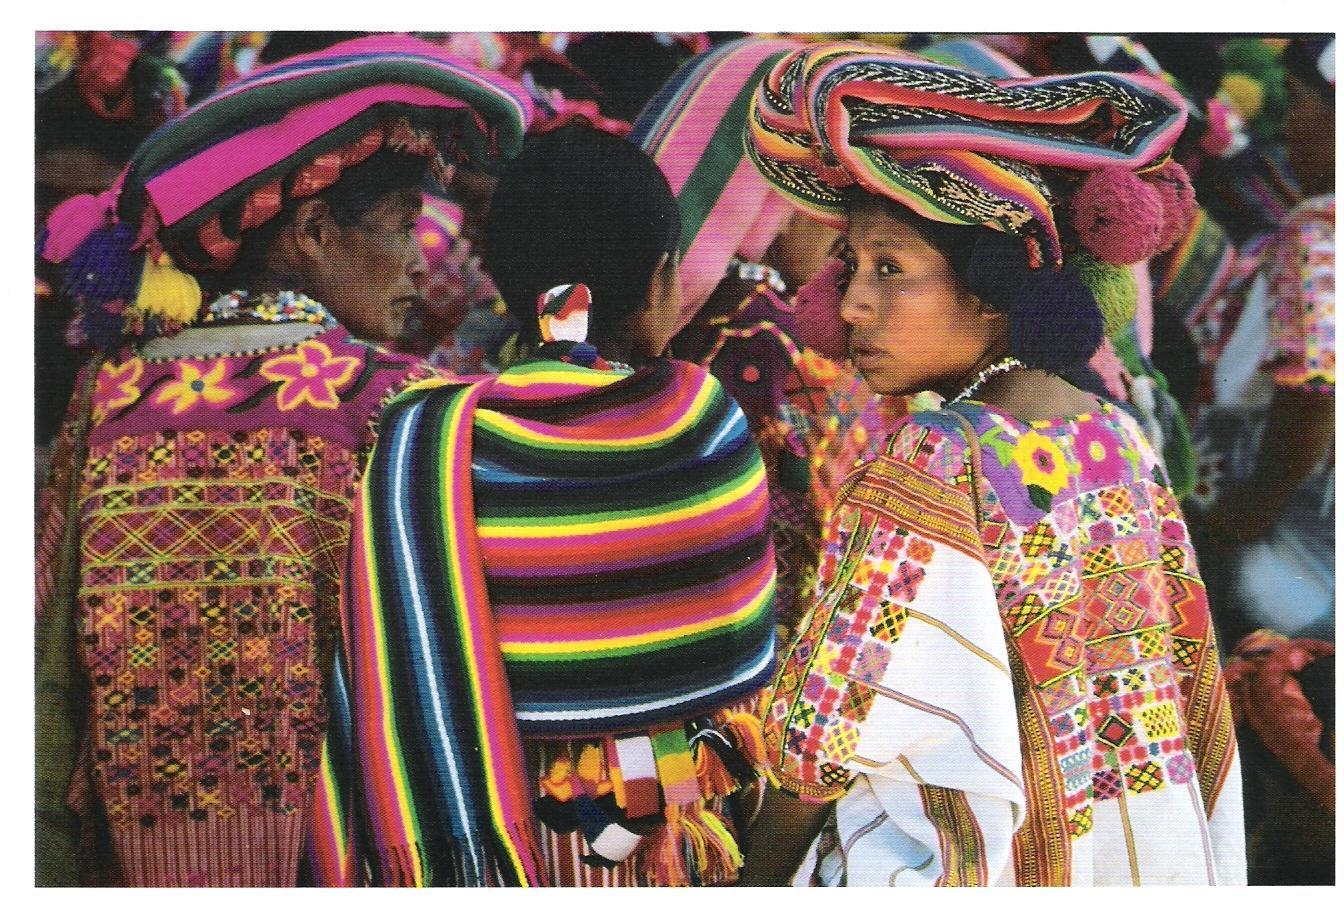 tags mayan inspired fashion musings